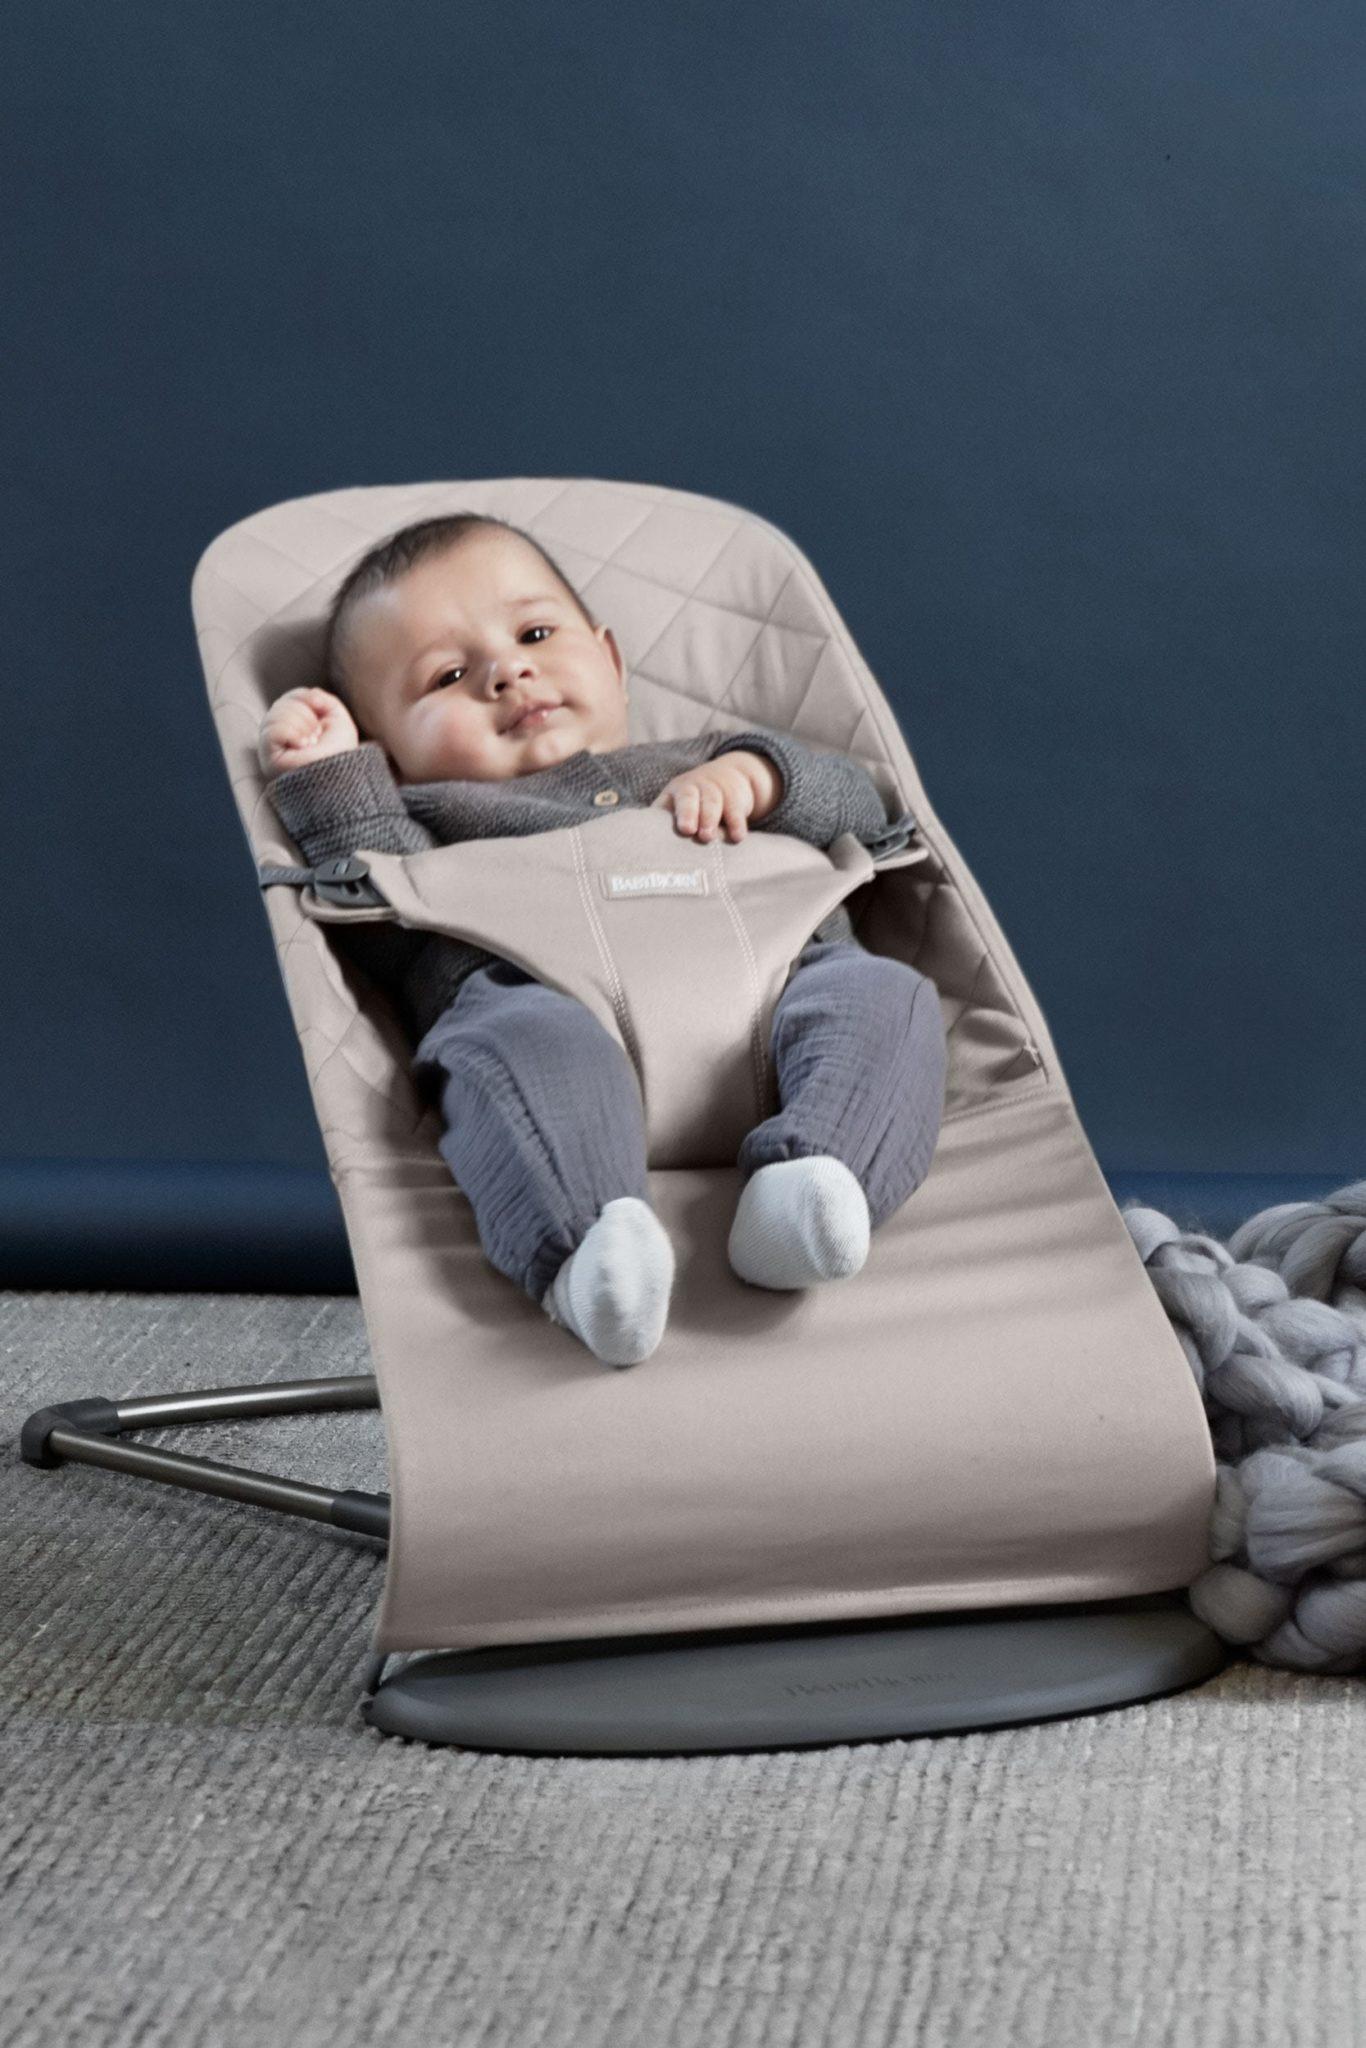 Babybjorn Bouncer Bliss Sand Grey Cotton 006017 001